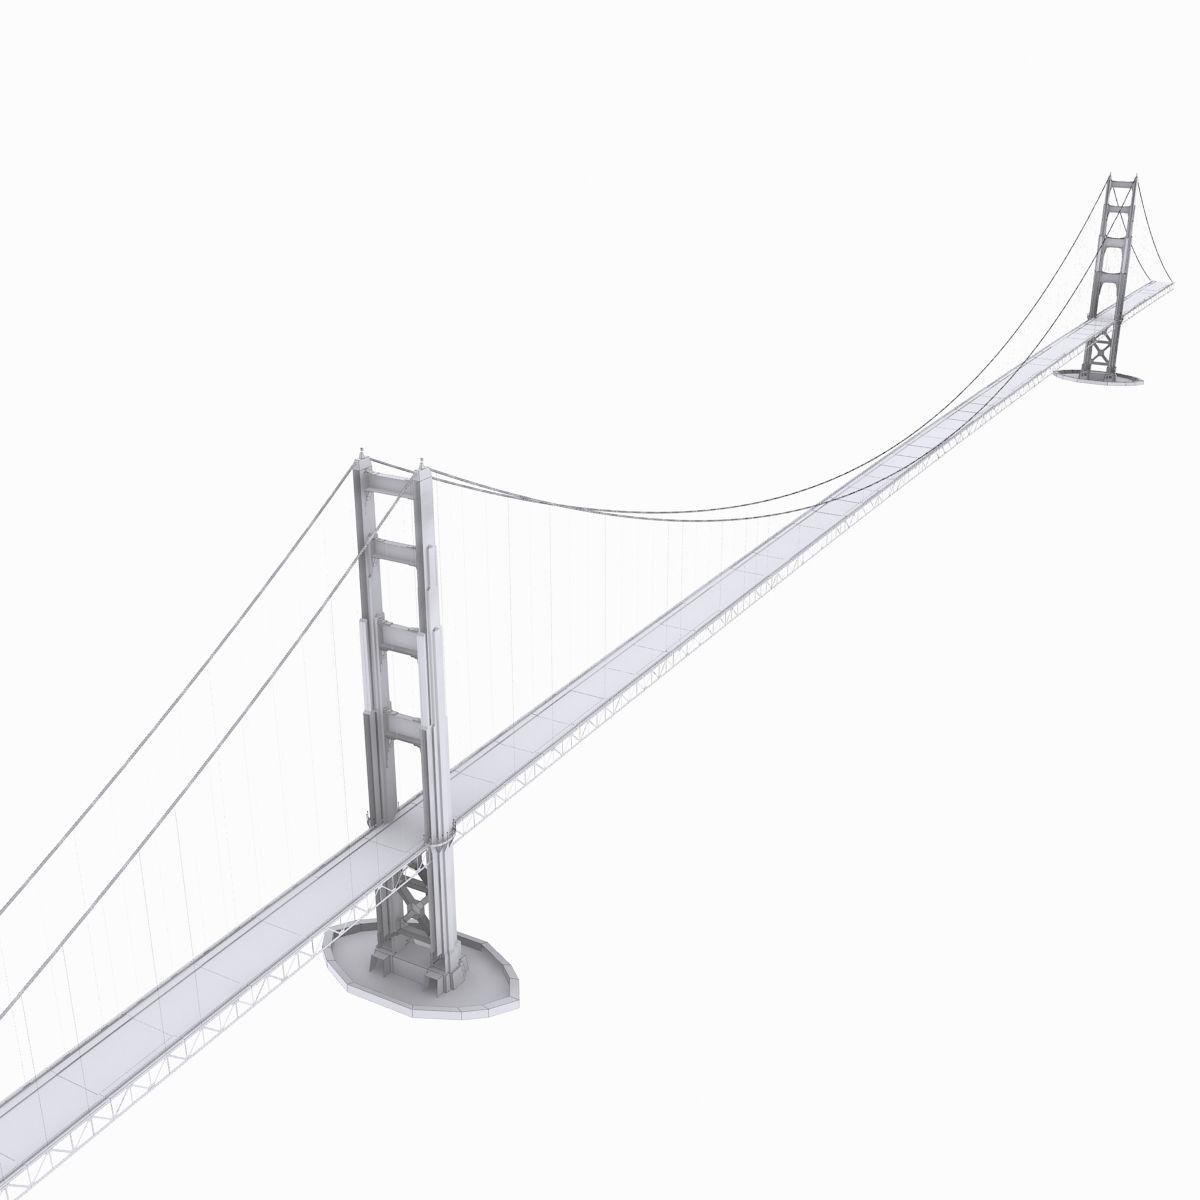 1200x1200 Suspension Bridge 3d Pbr Cgtrader